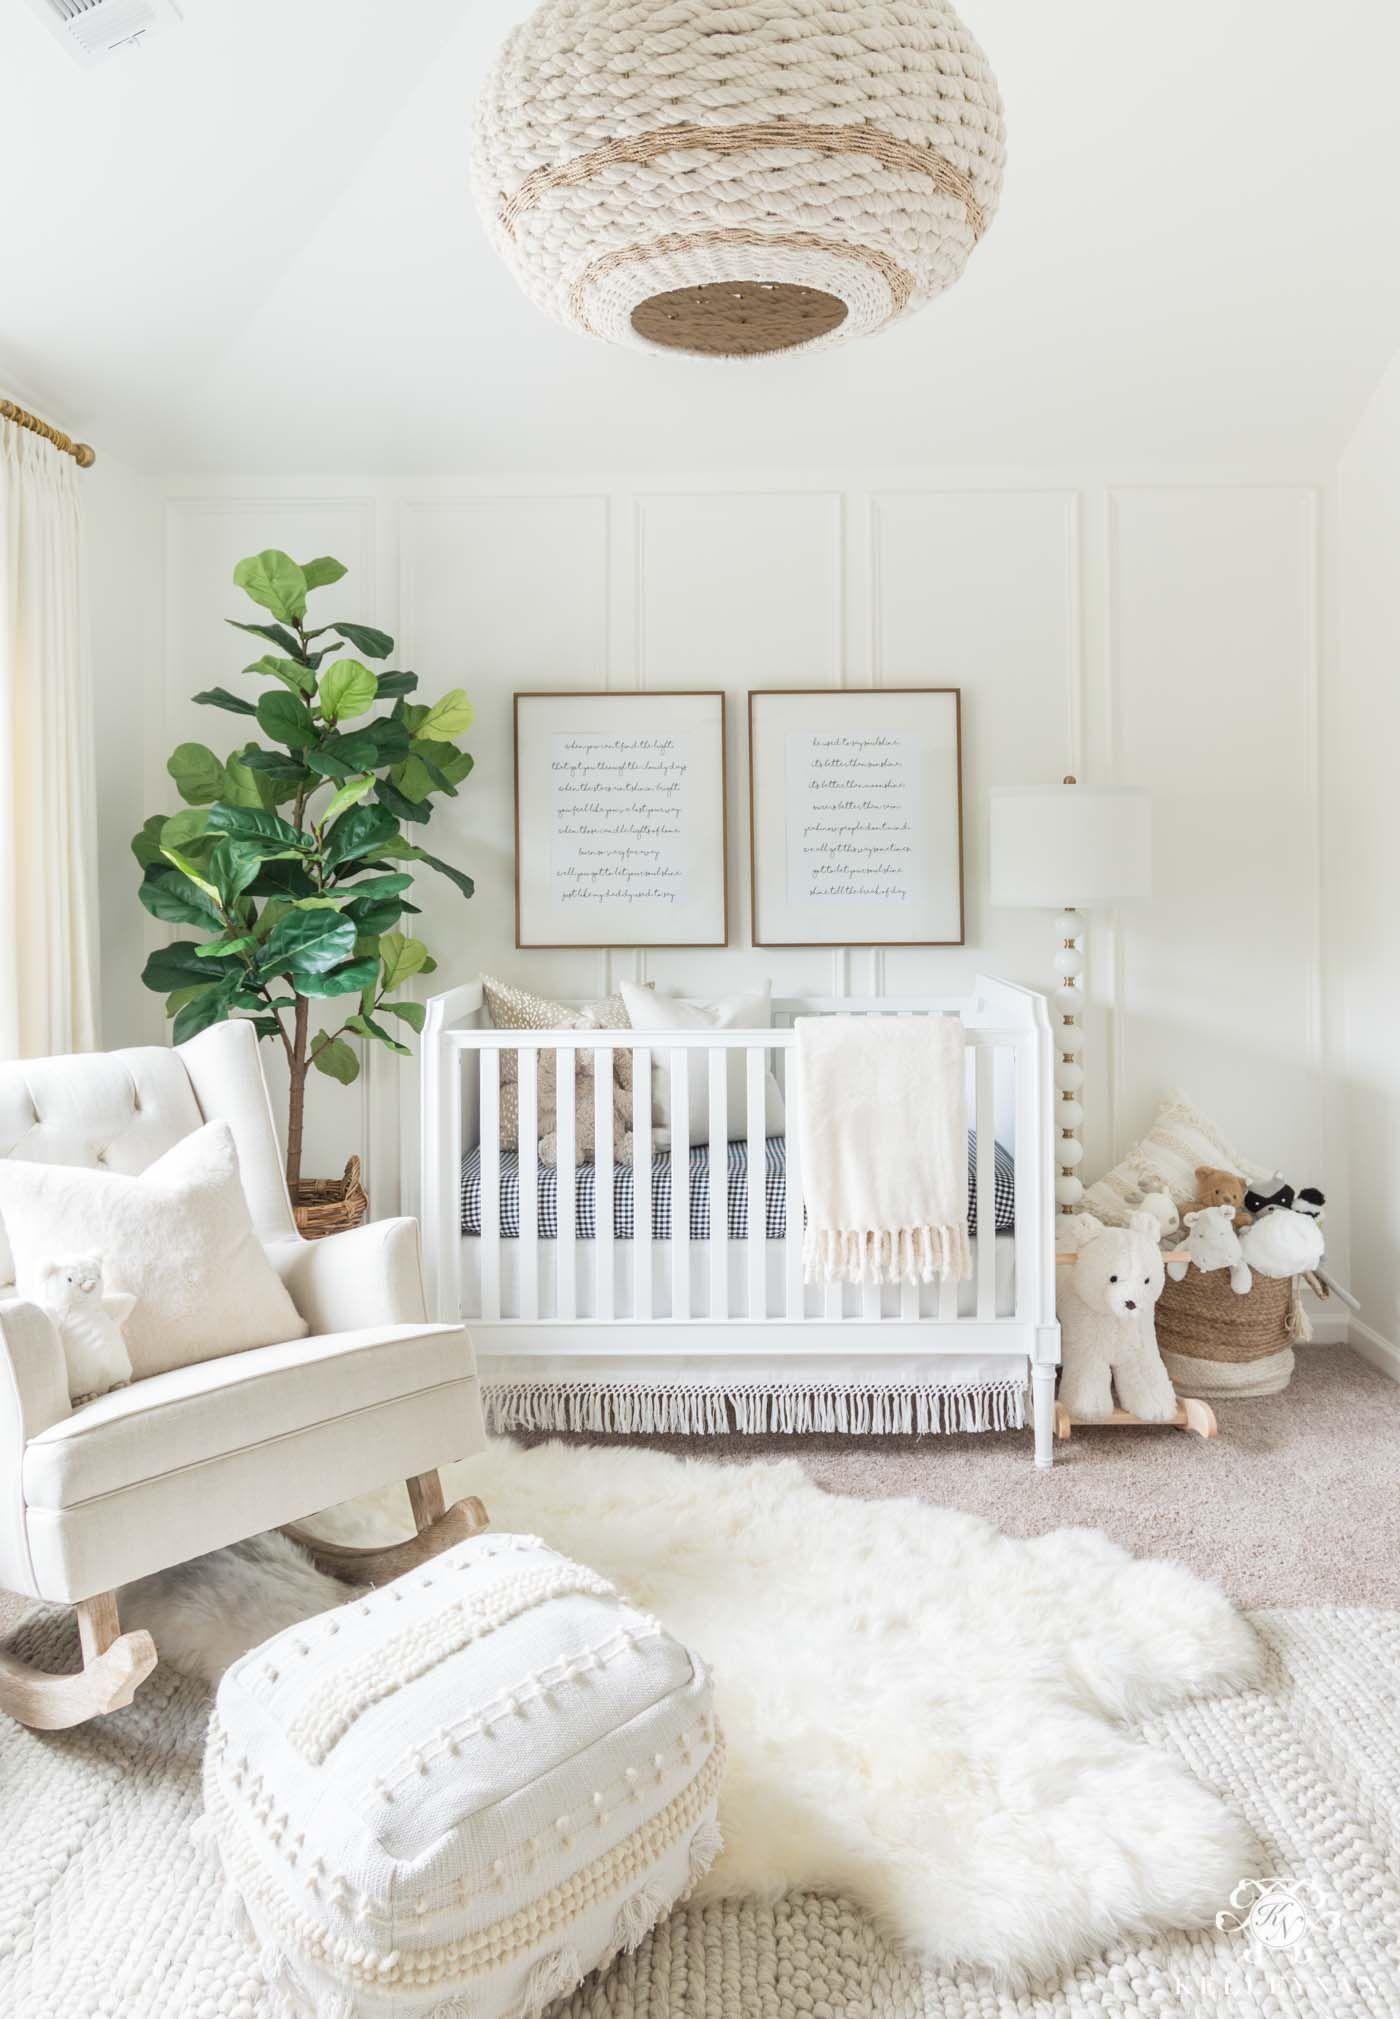 Gender Neutral Nursery Design – Pefect for Boys & Girls! | Kelley Nan